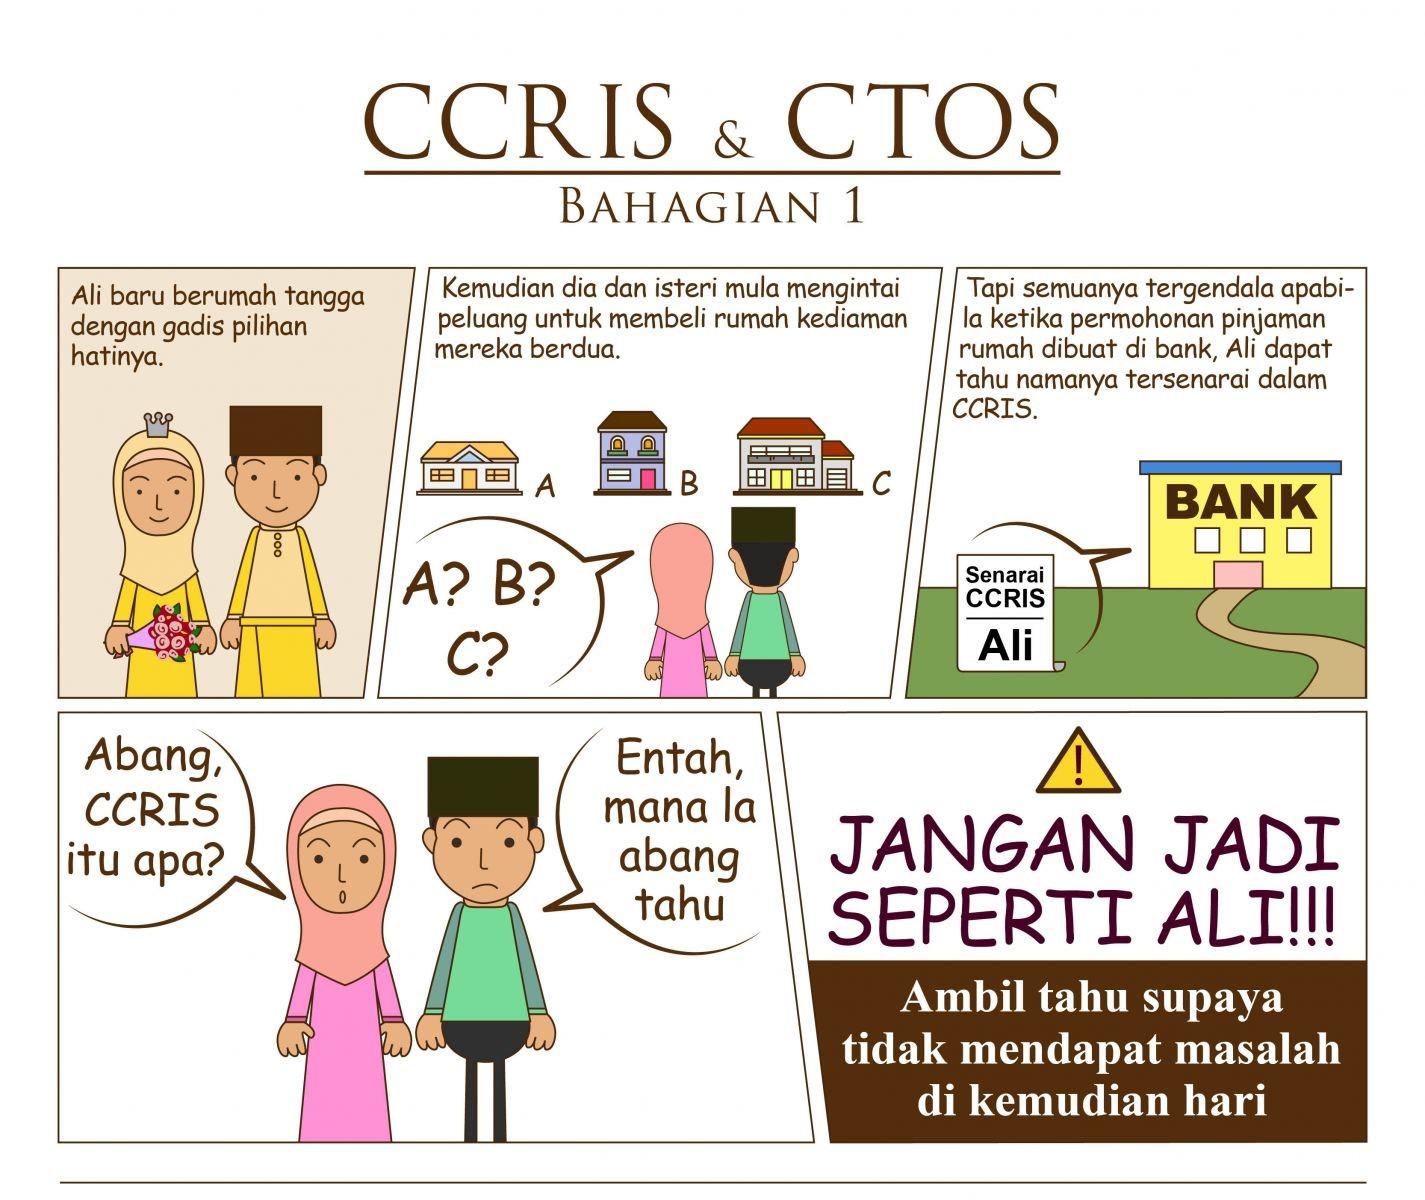 Apa kebendanya CCRIS